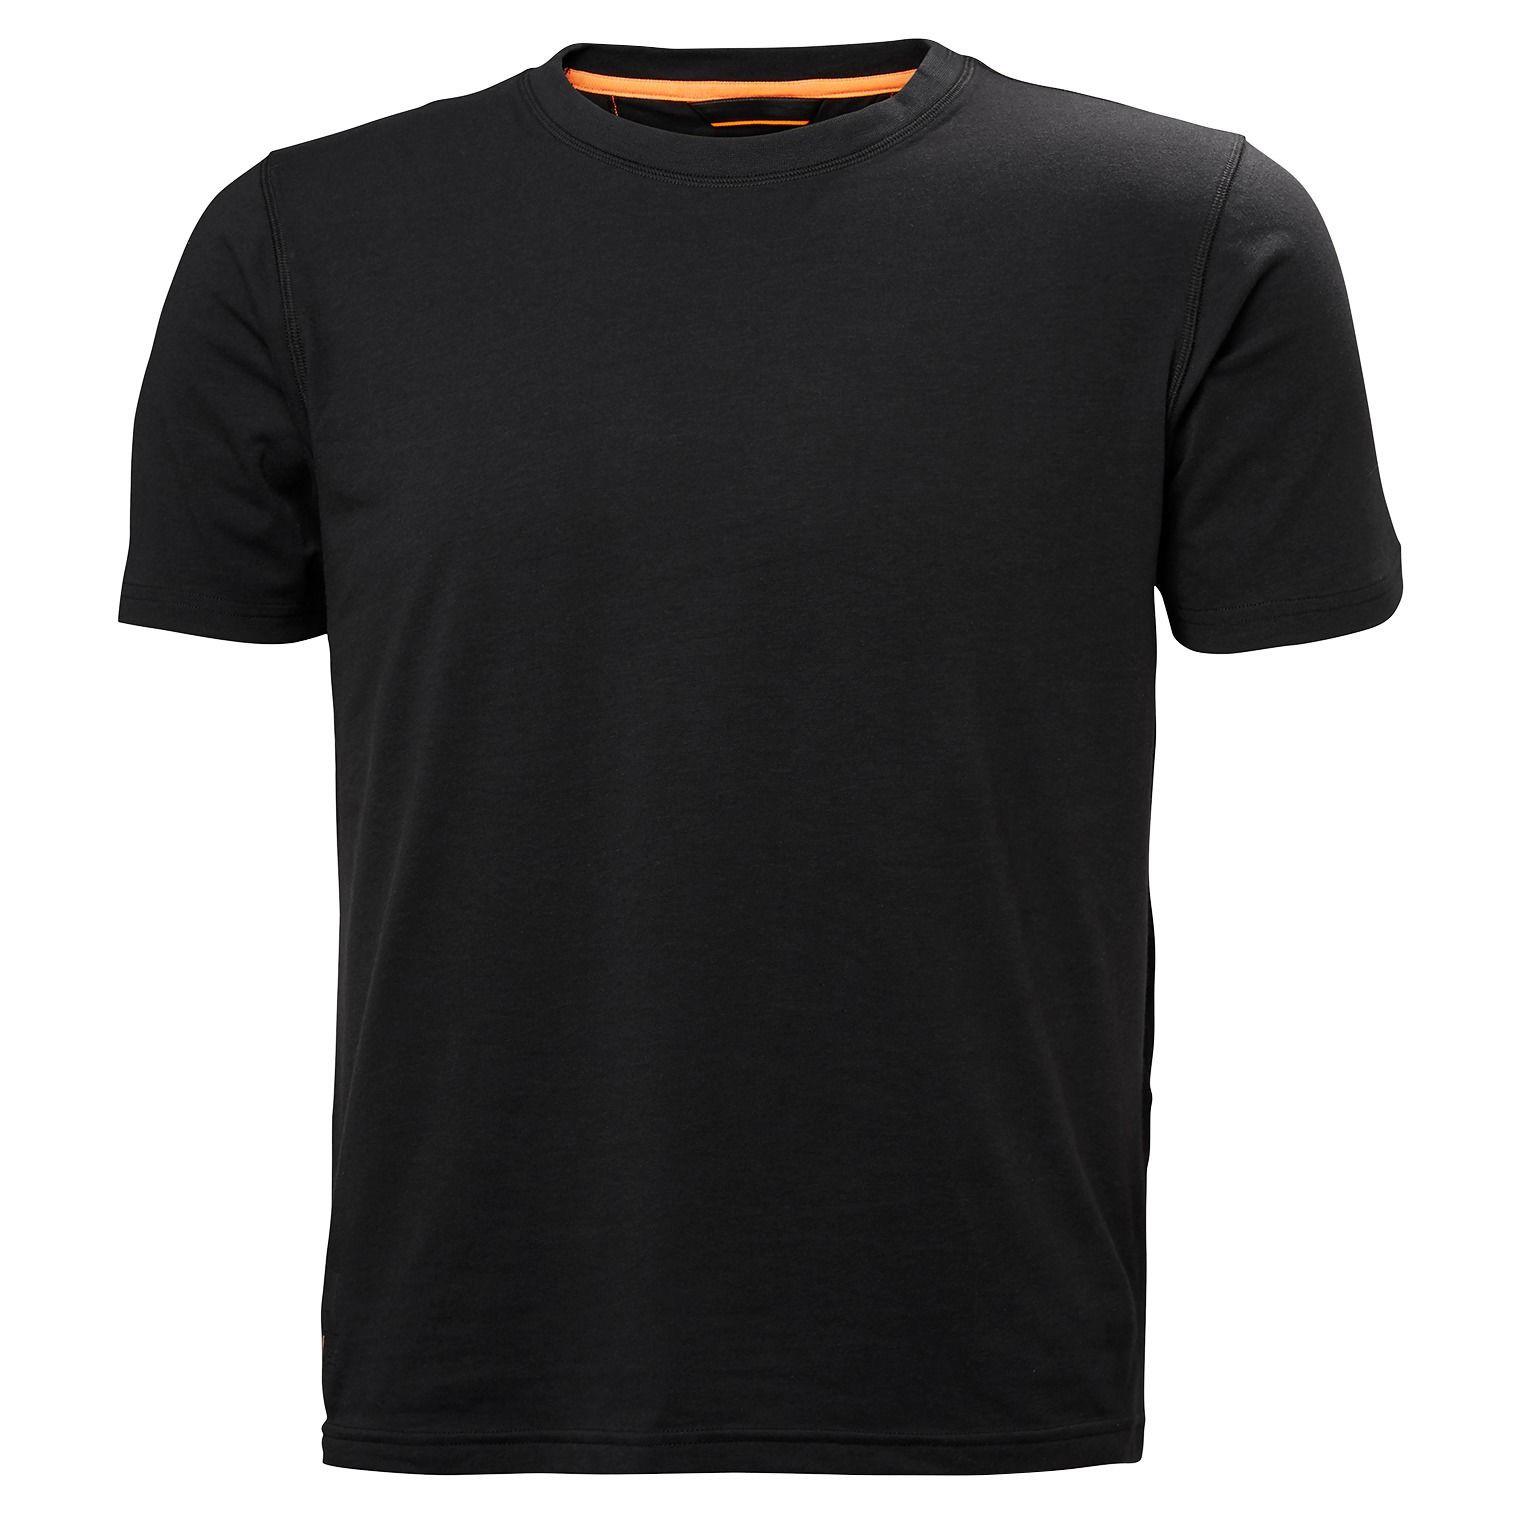 Футболка Helly Hansen Chelsea Evolution Tee 79198 (Black)